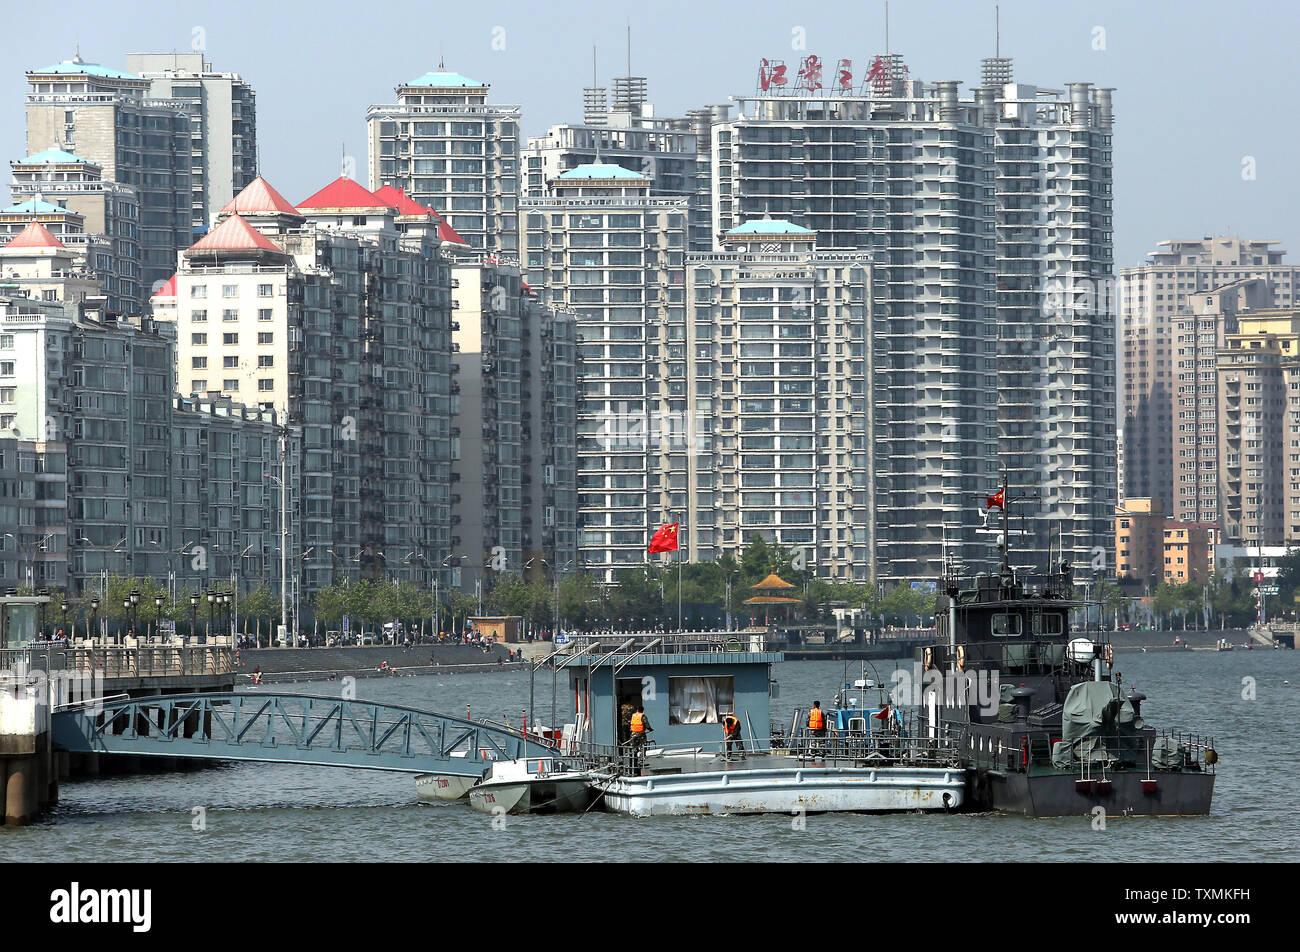 Military Patrol Boats Stock Photos & Military Patrol Boats